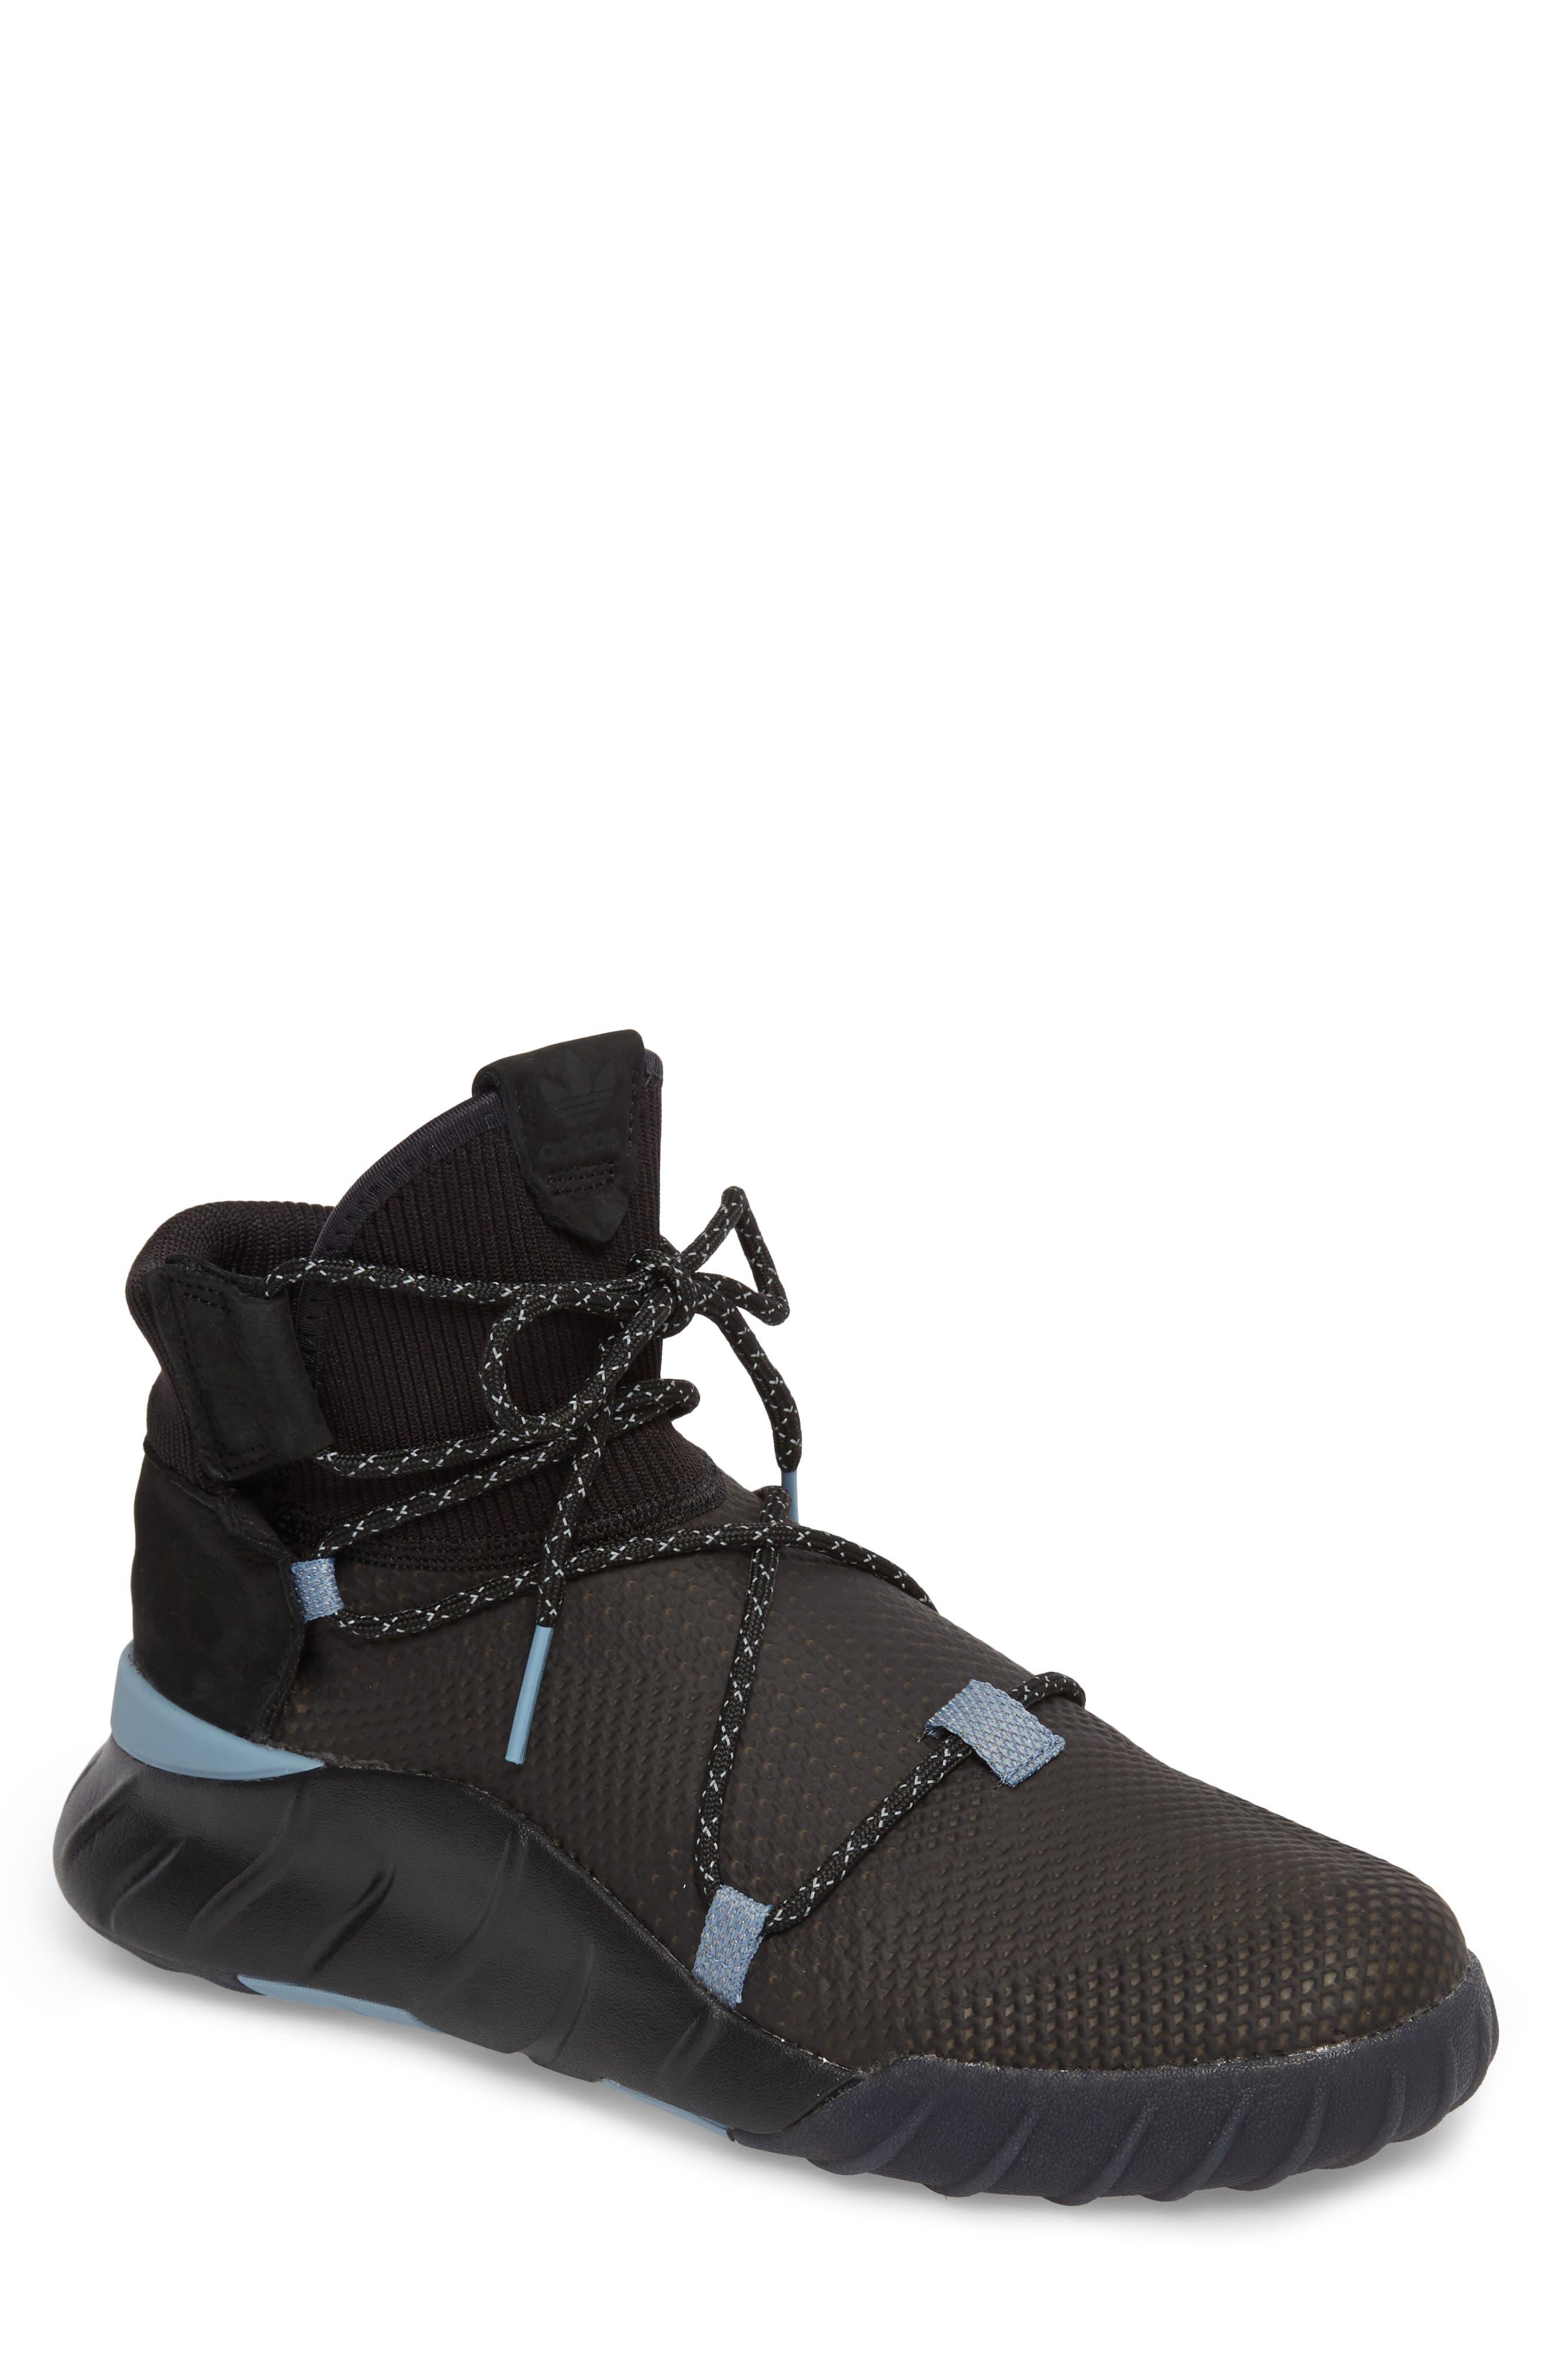 Tubular X 2.0 PK Sneaker,                         Main,                         color, 001